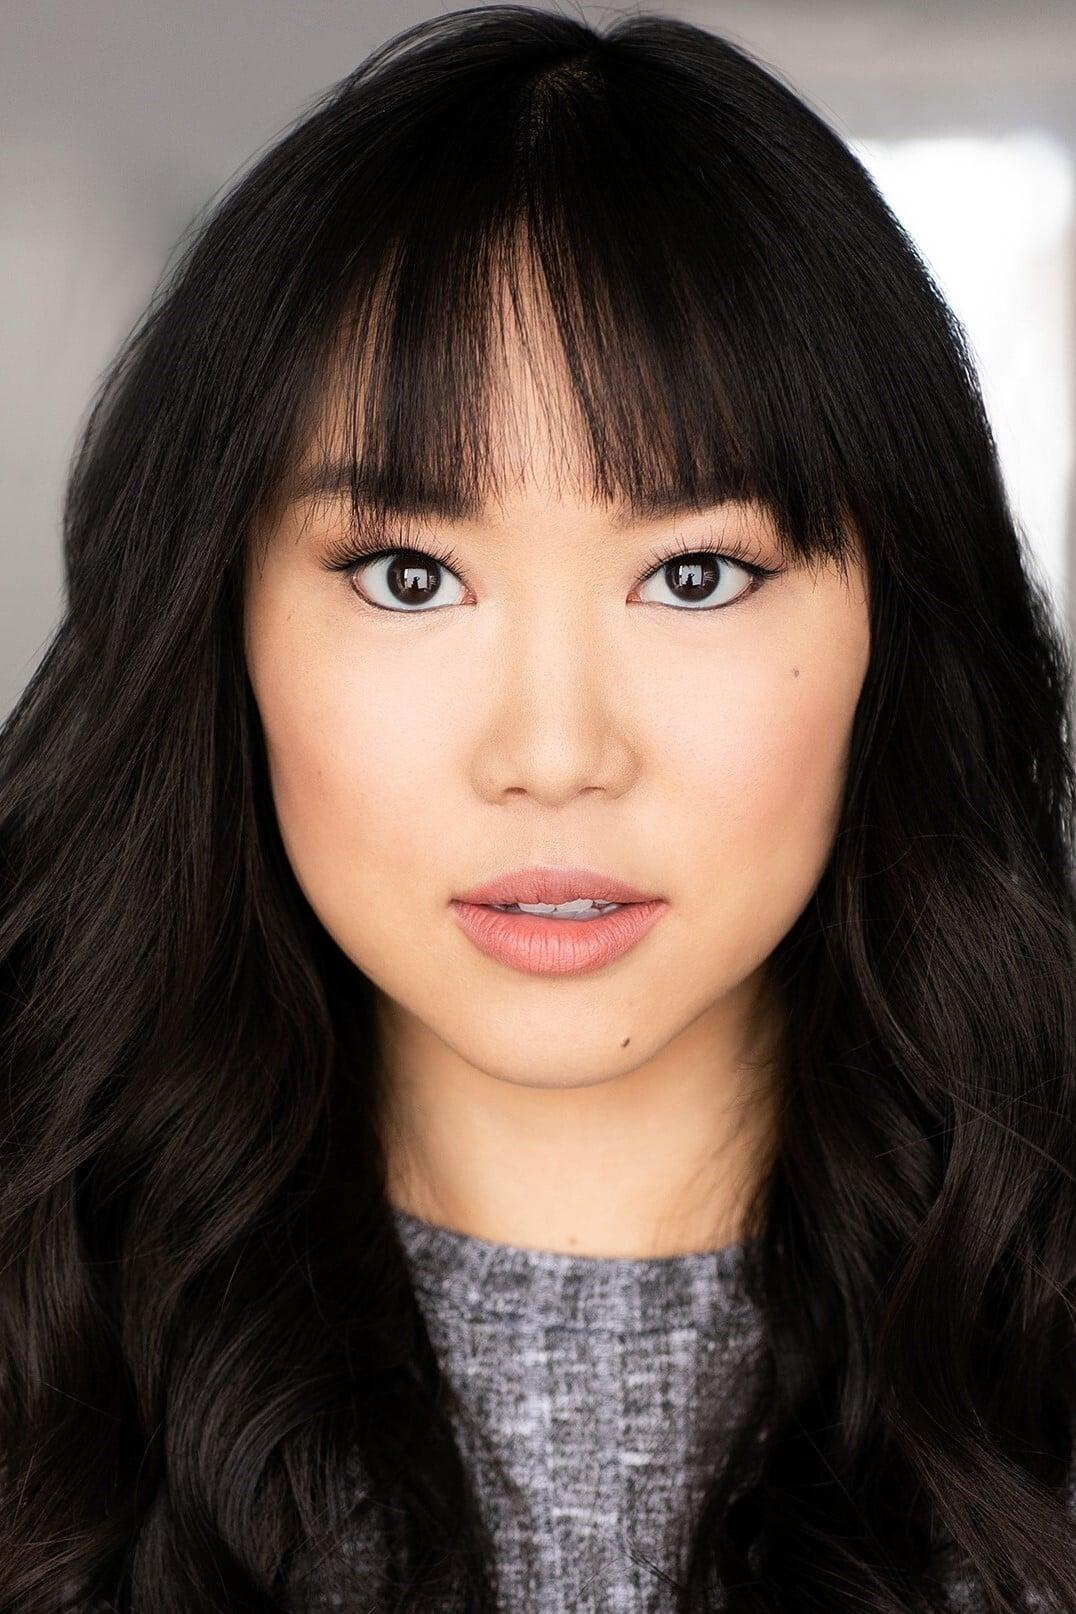 Valerie Yu